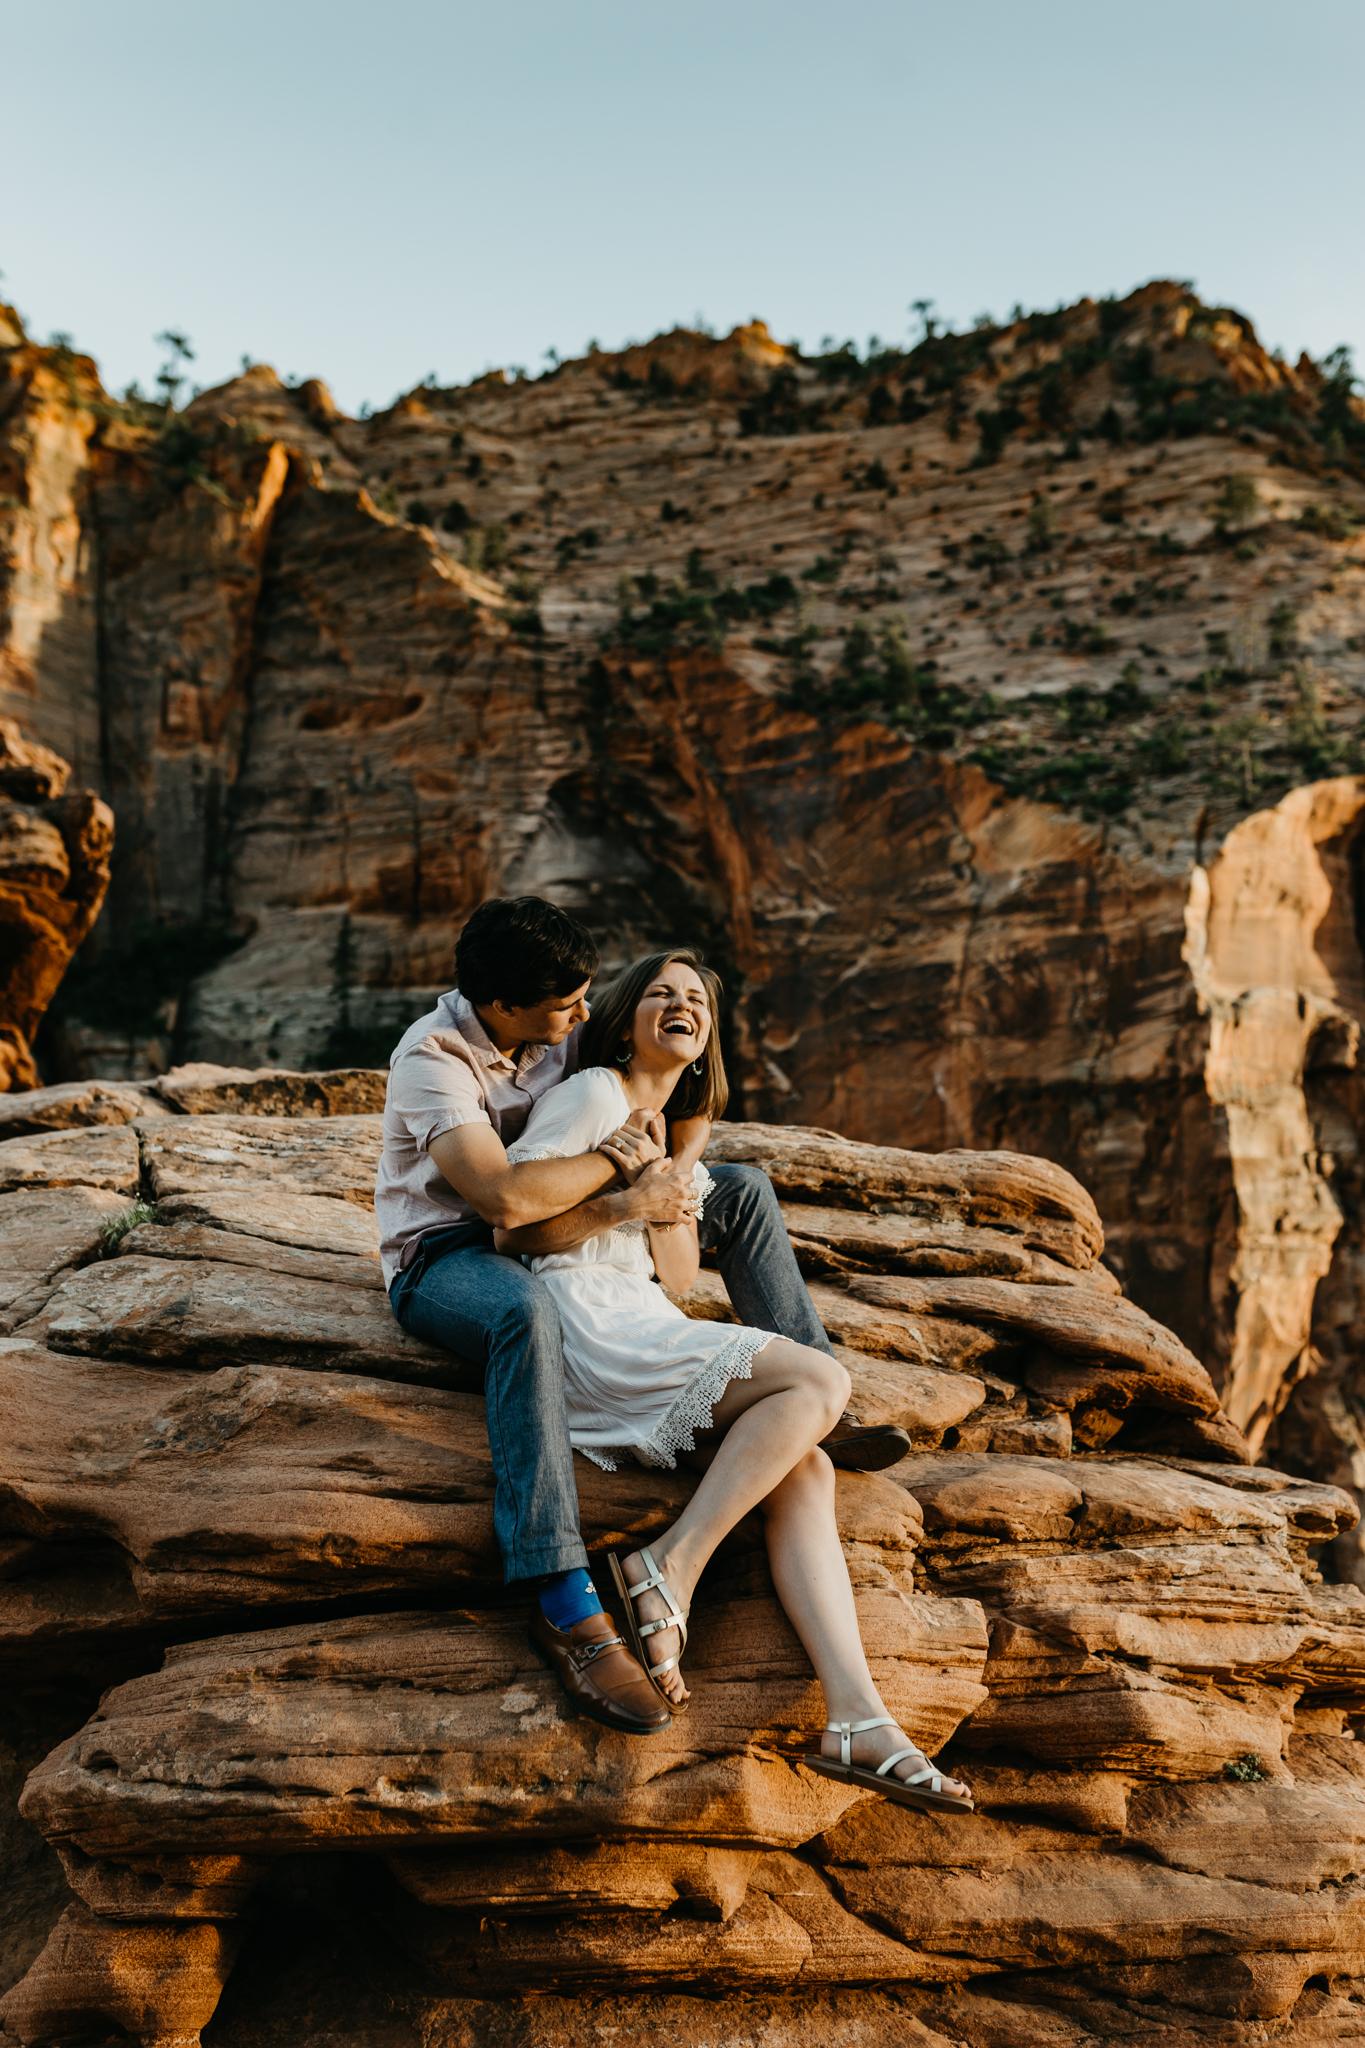 Abby&Austin-Engagement-shoot-Zion-National-Park-8523.jpg